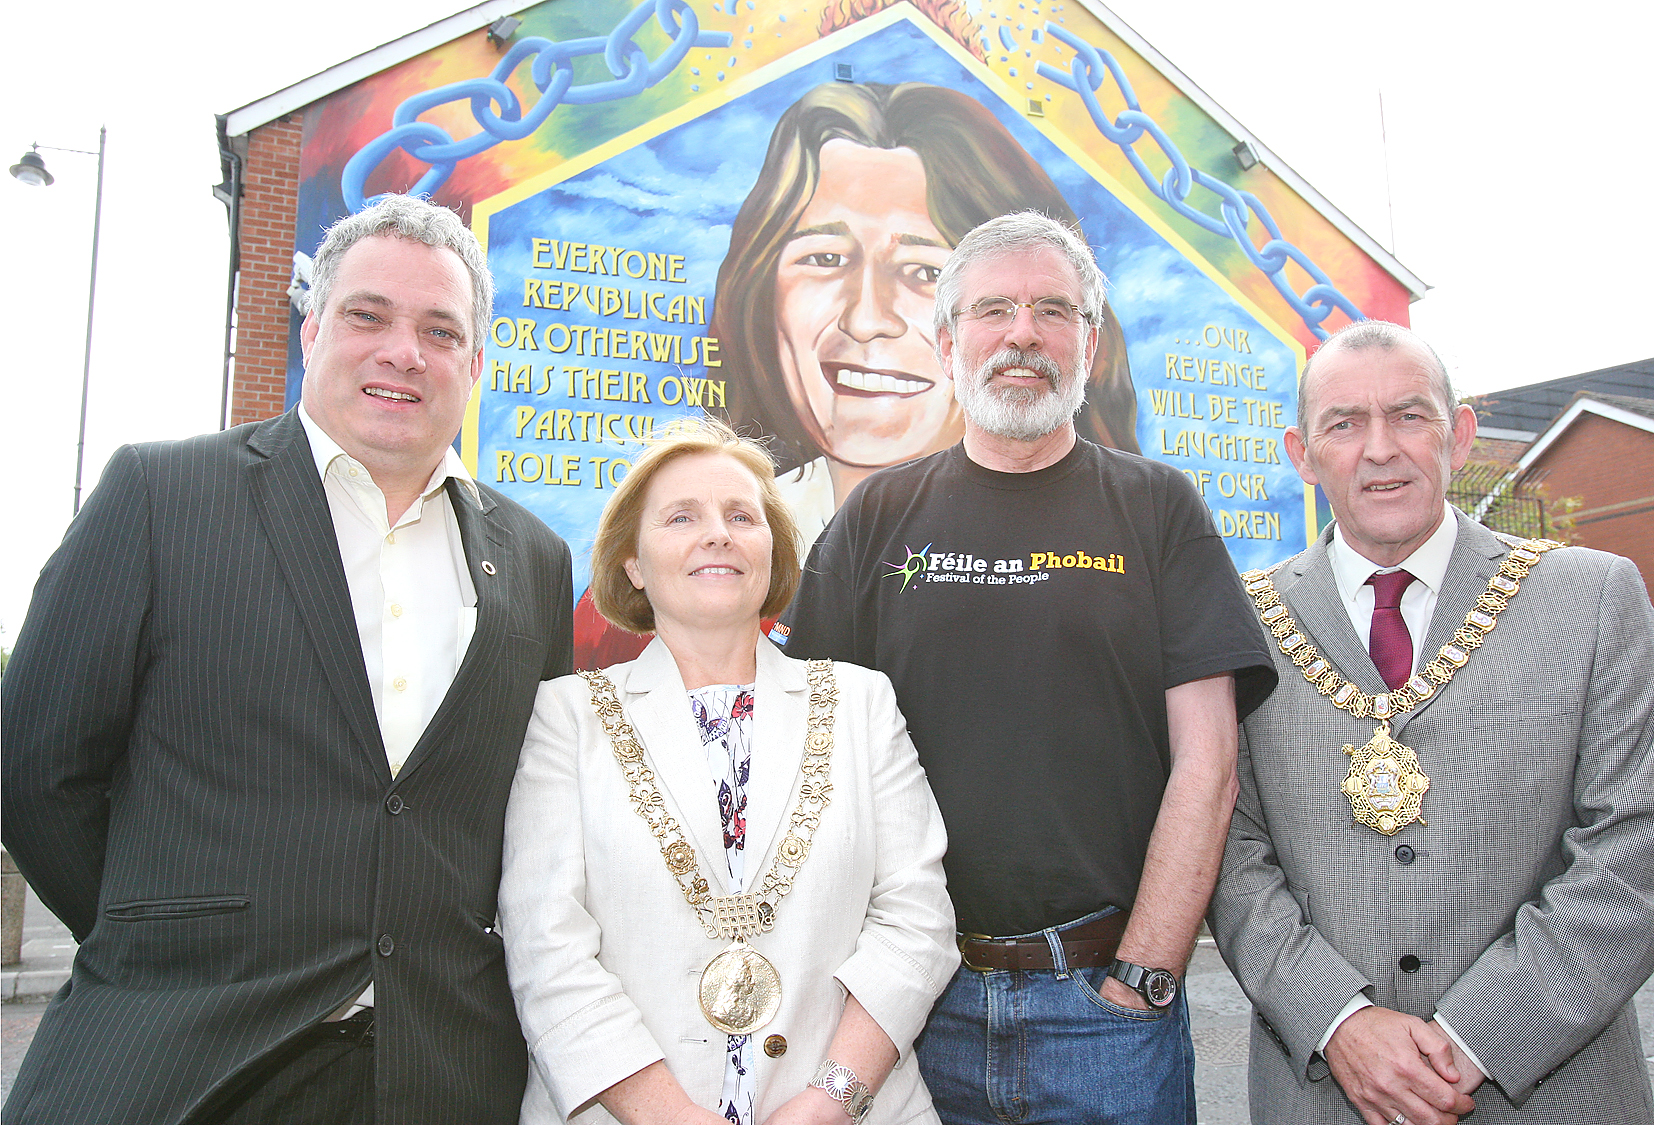 Gerry adams dublin belfast mayors 248mj15